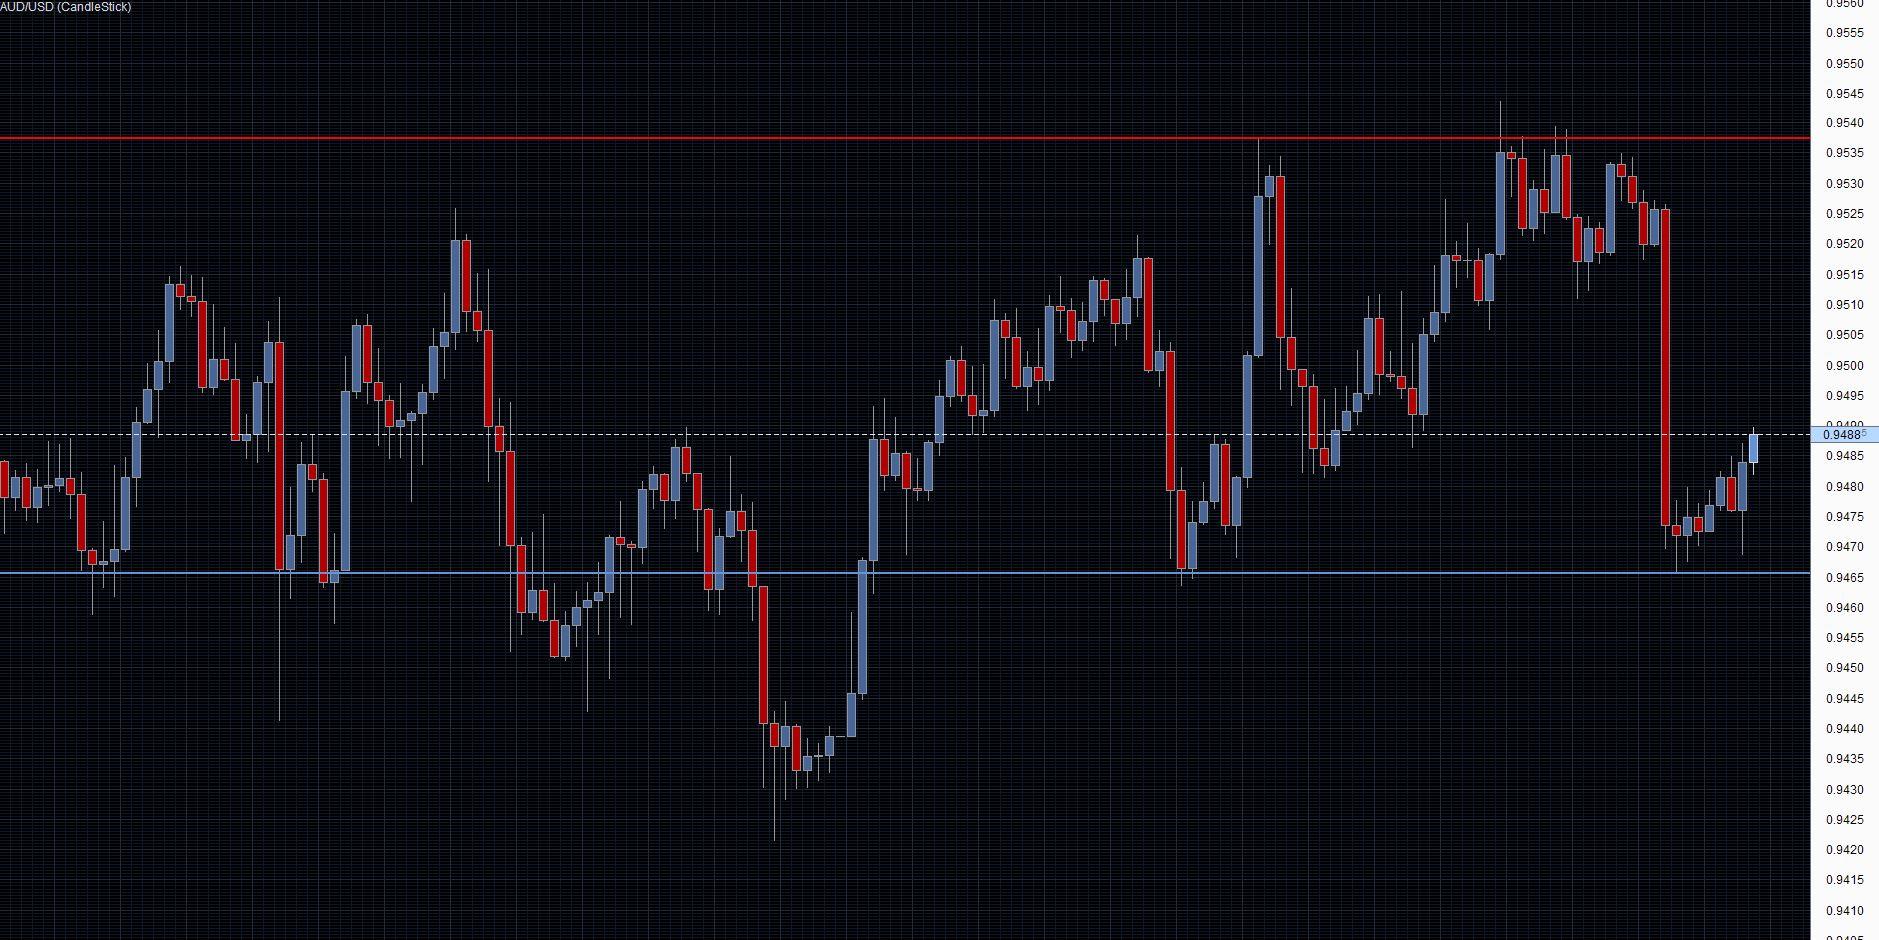 AUD/USD Chart 07/11/2013